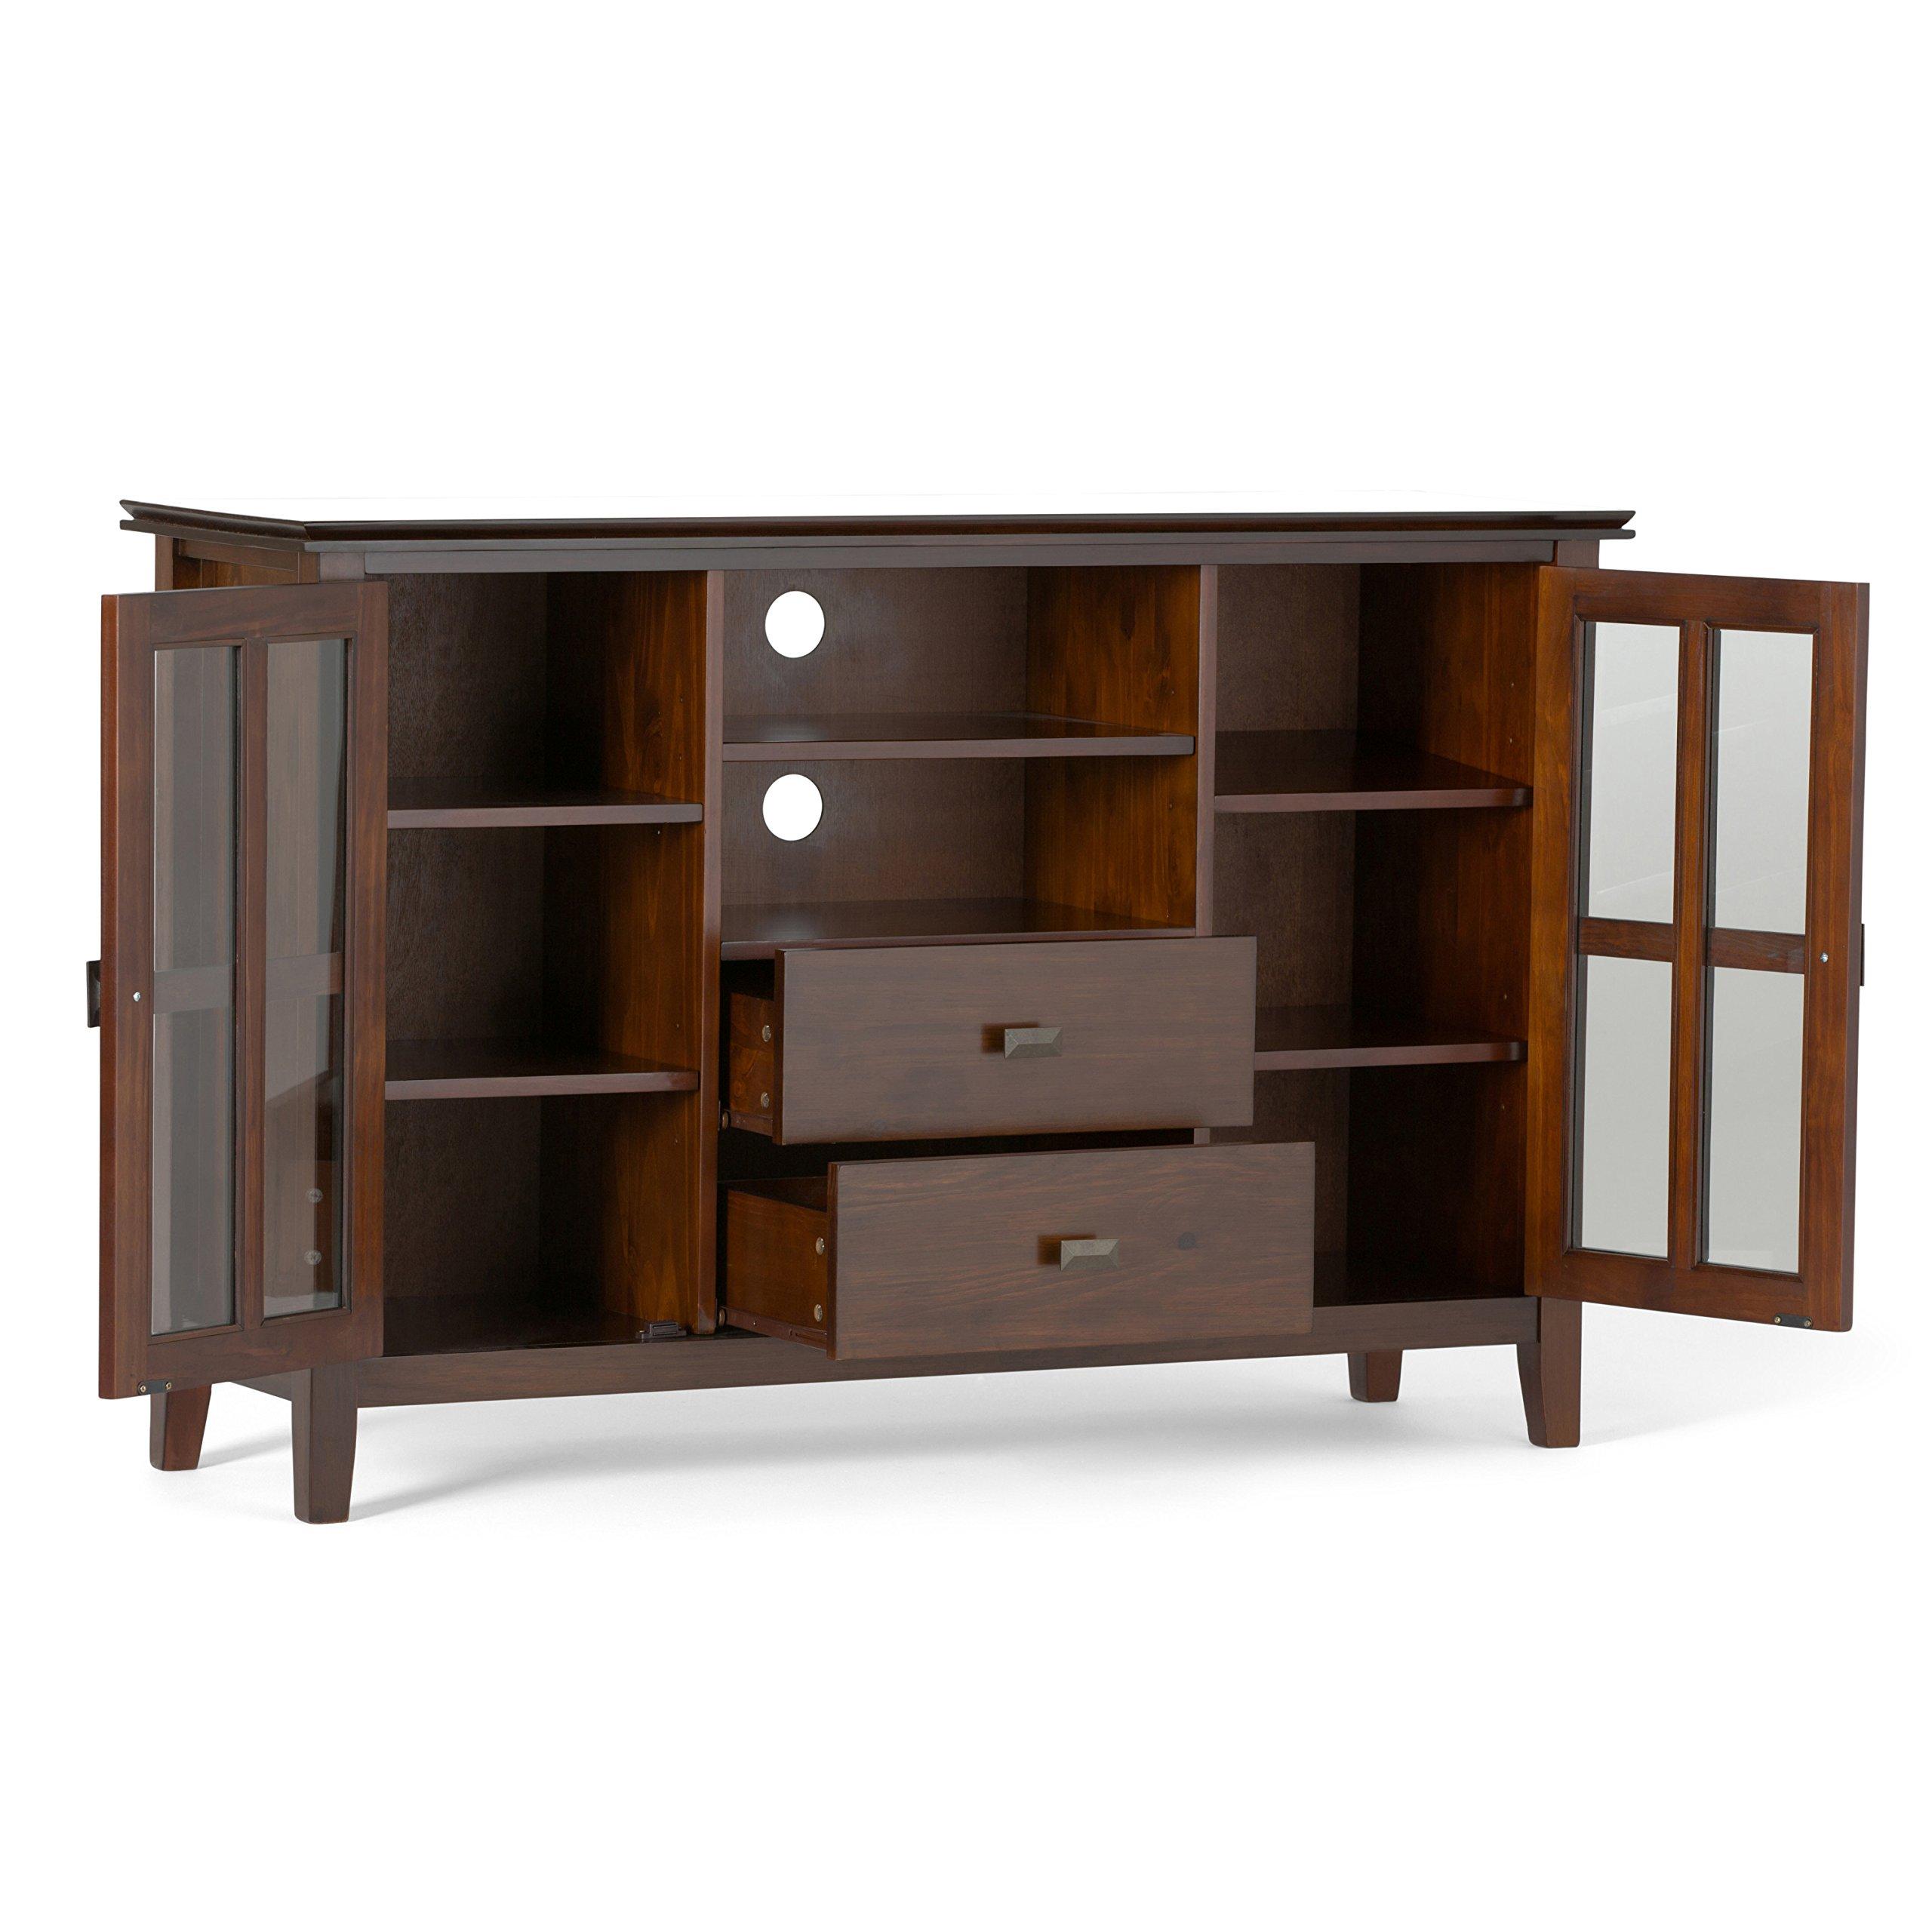 Simpli Home Artisan TV Media Stand for TVs up to 60'', Medium Auburn Brown by Simpli Home (Image #3)